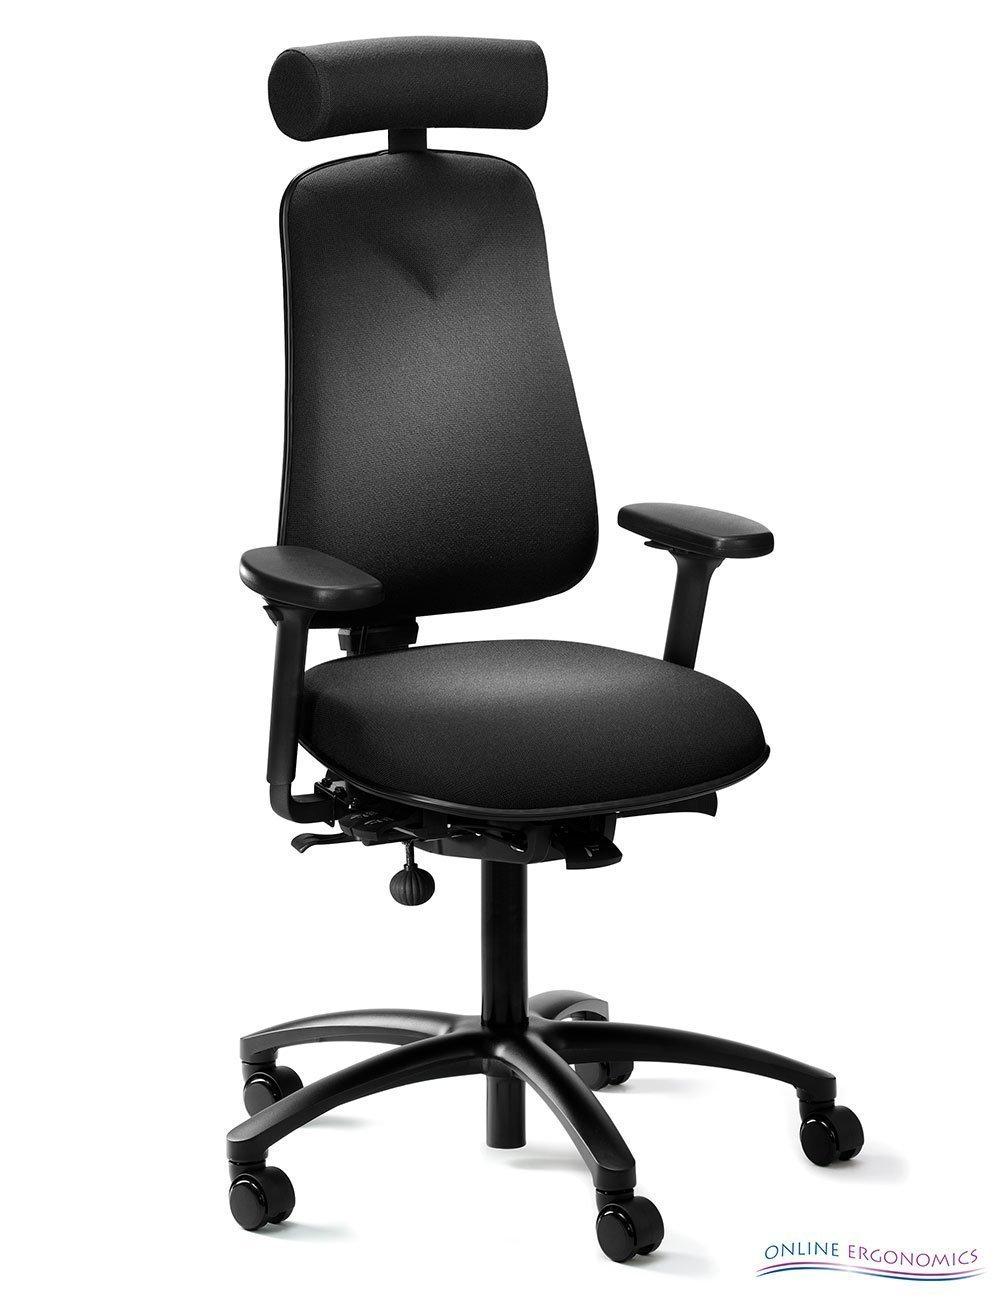 Hoganasmobler 381 Office Chair Online Ergonomics